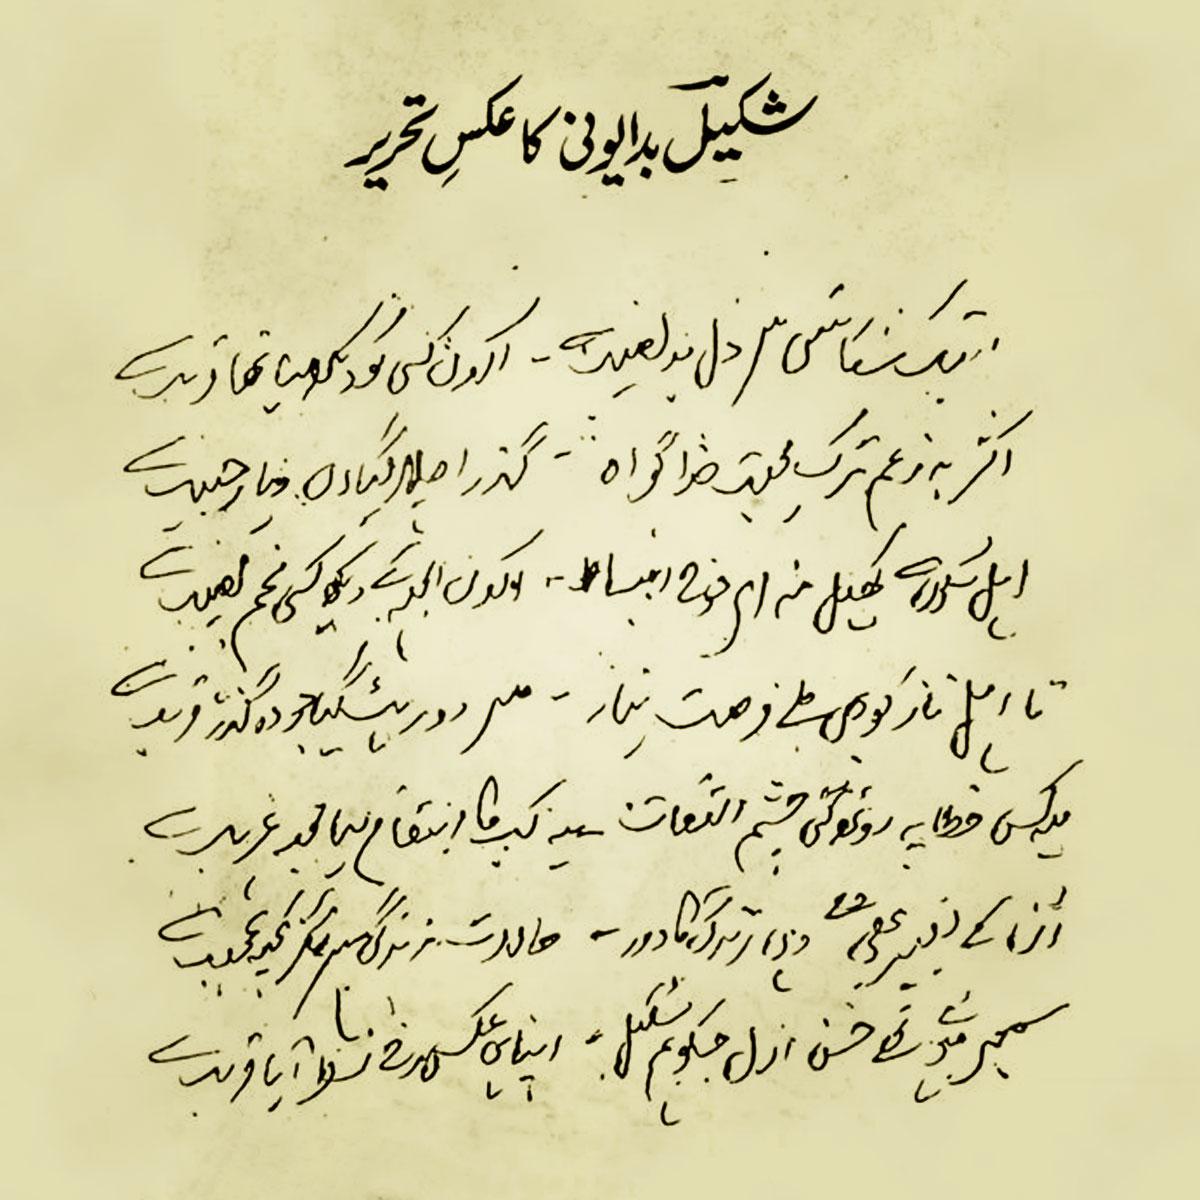 Shakeel Badayuni ka Aks-e-Tehreer (Handwriting)